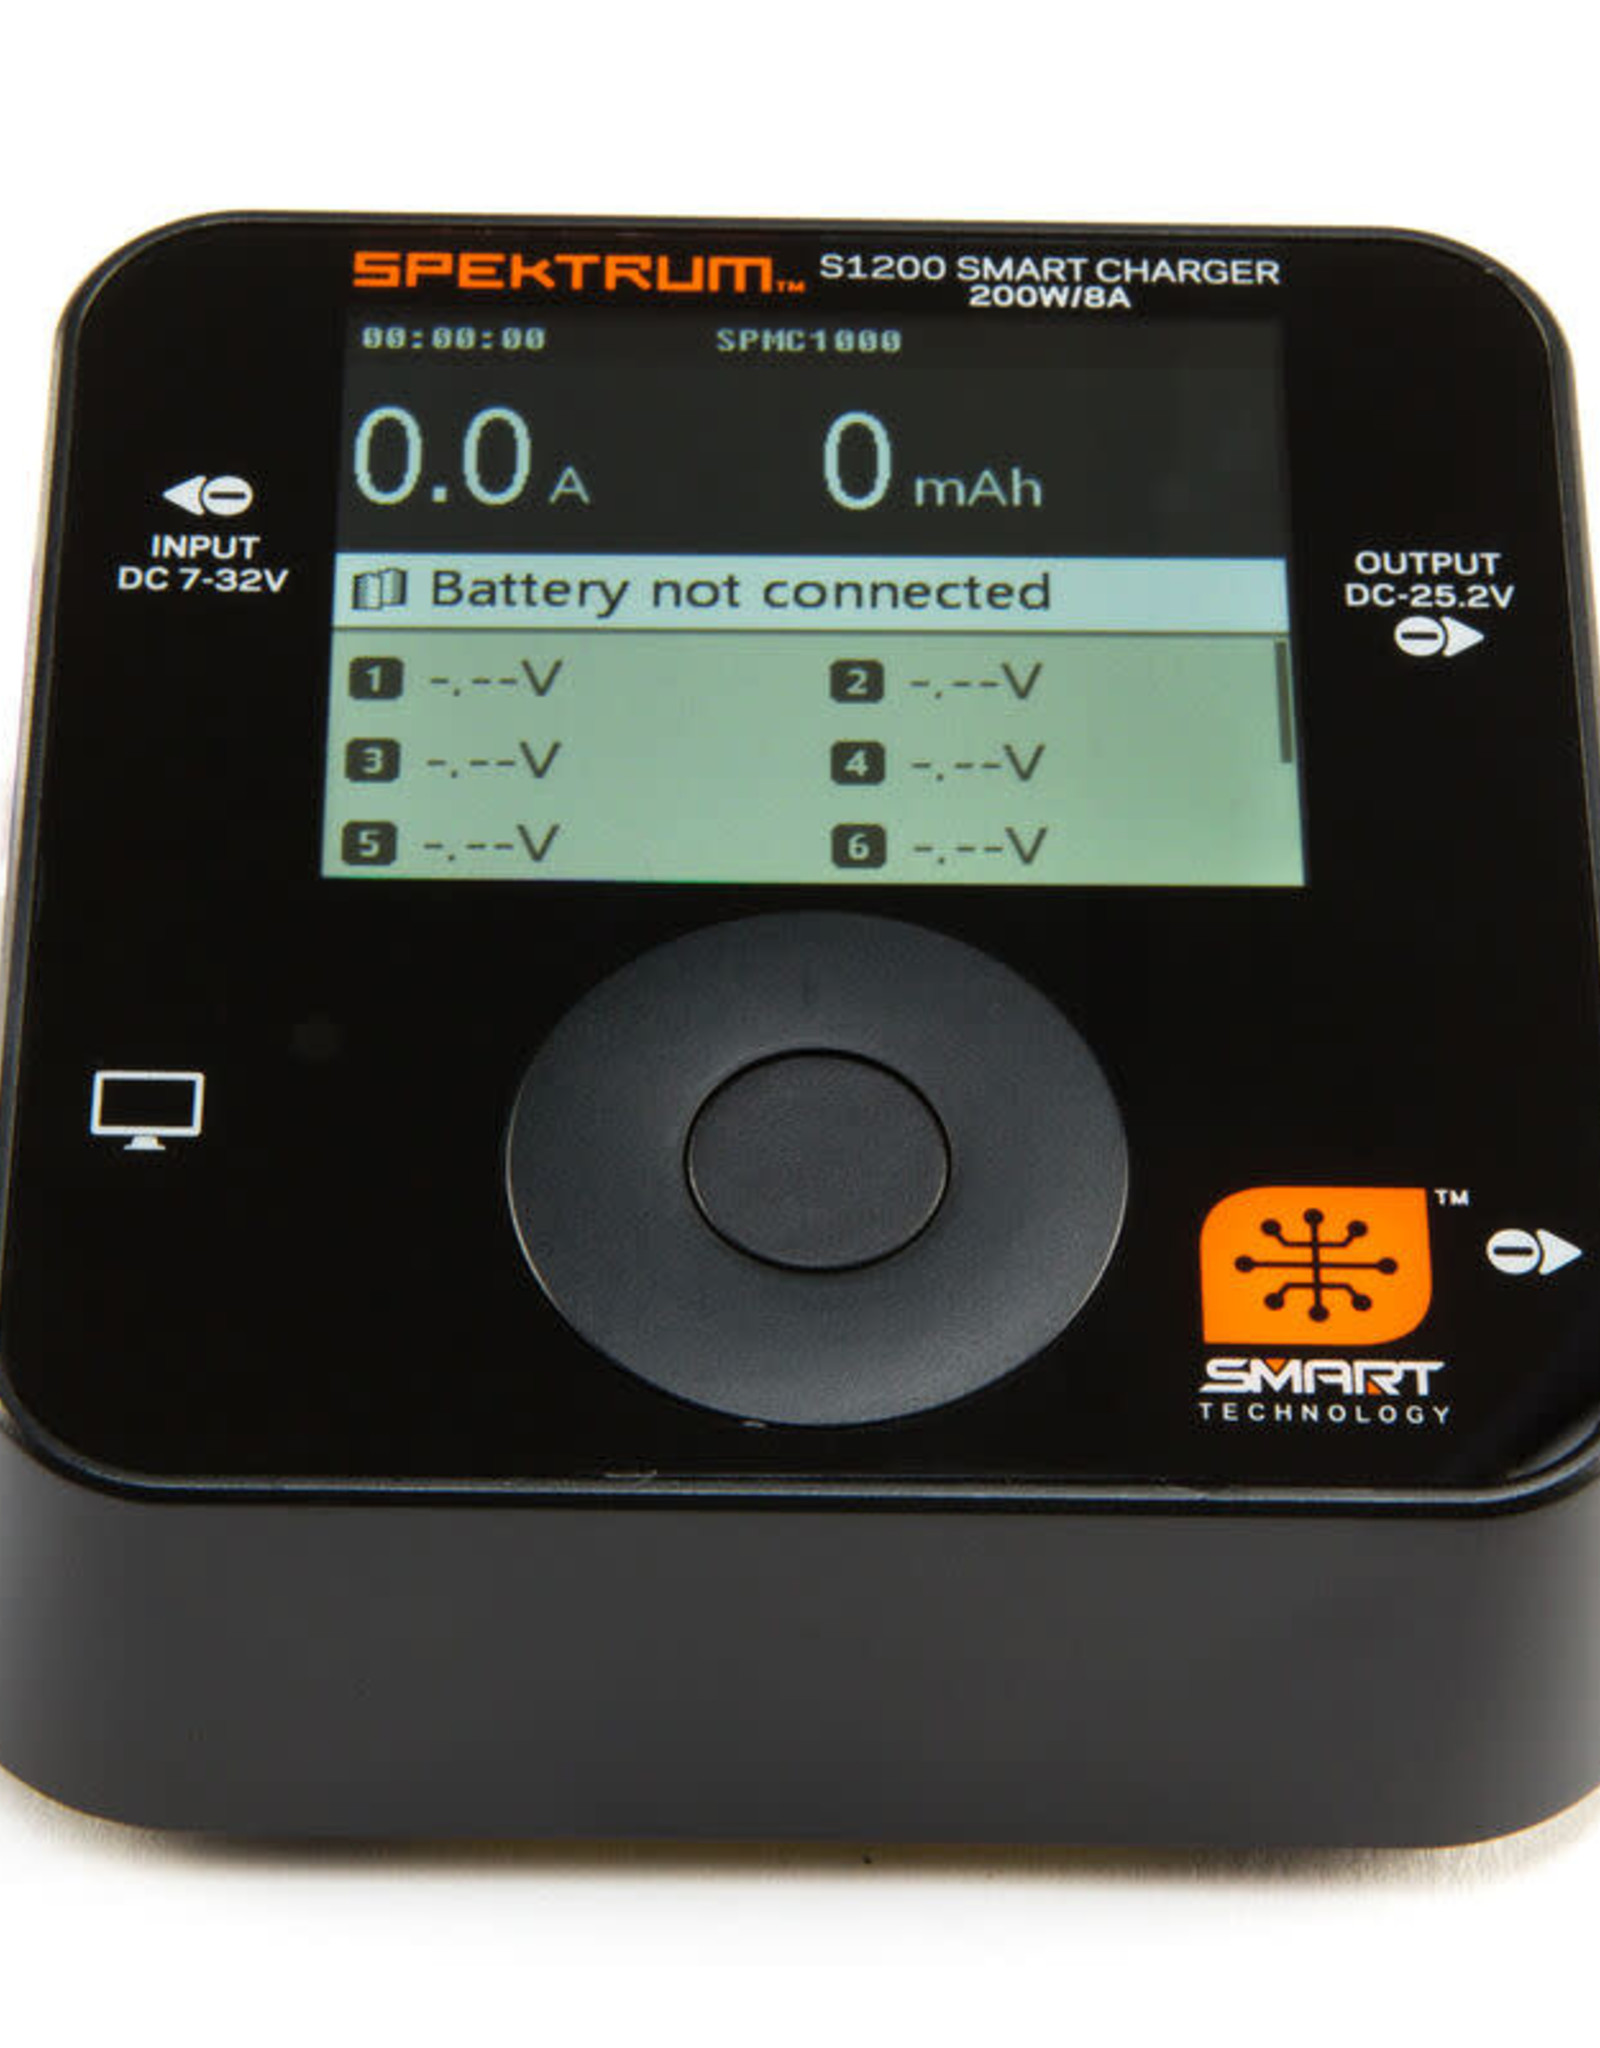 SPMXC1000 Spektrum Smart S1200 DC Charger, 1x200W